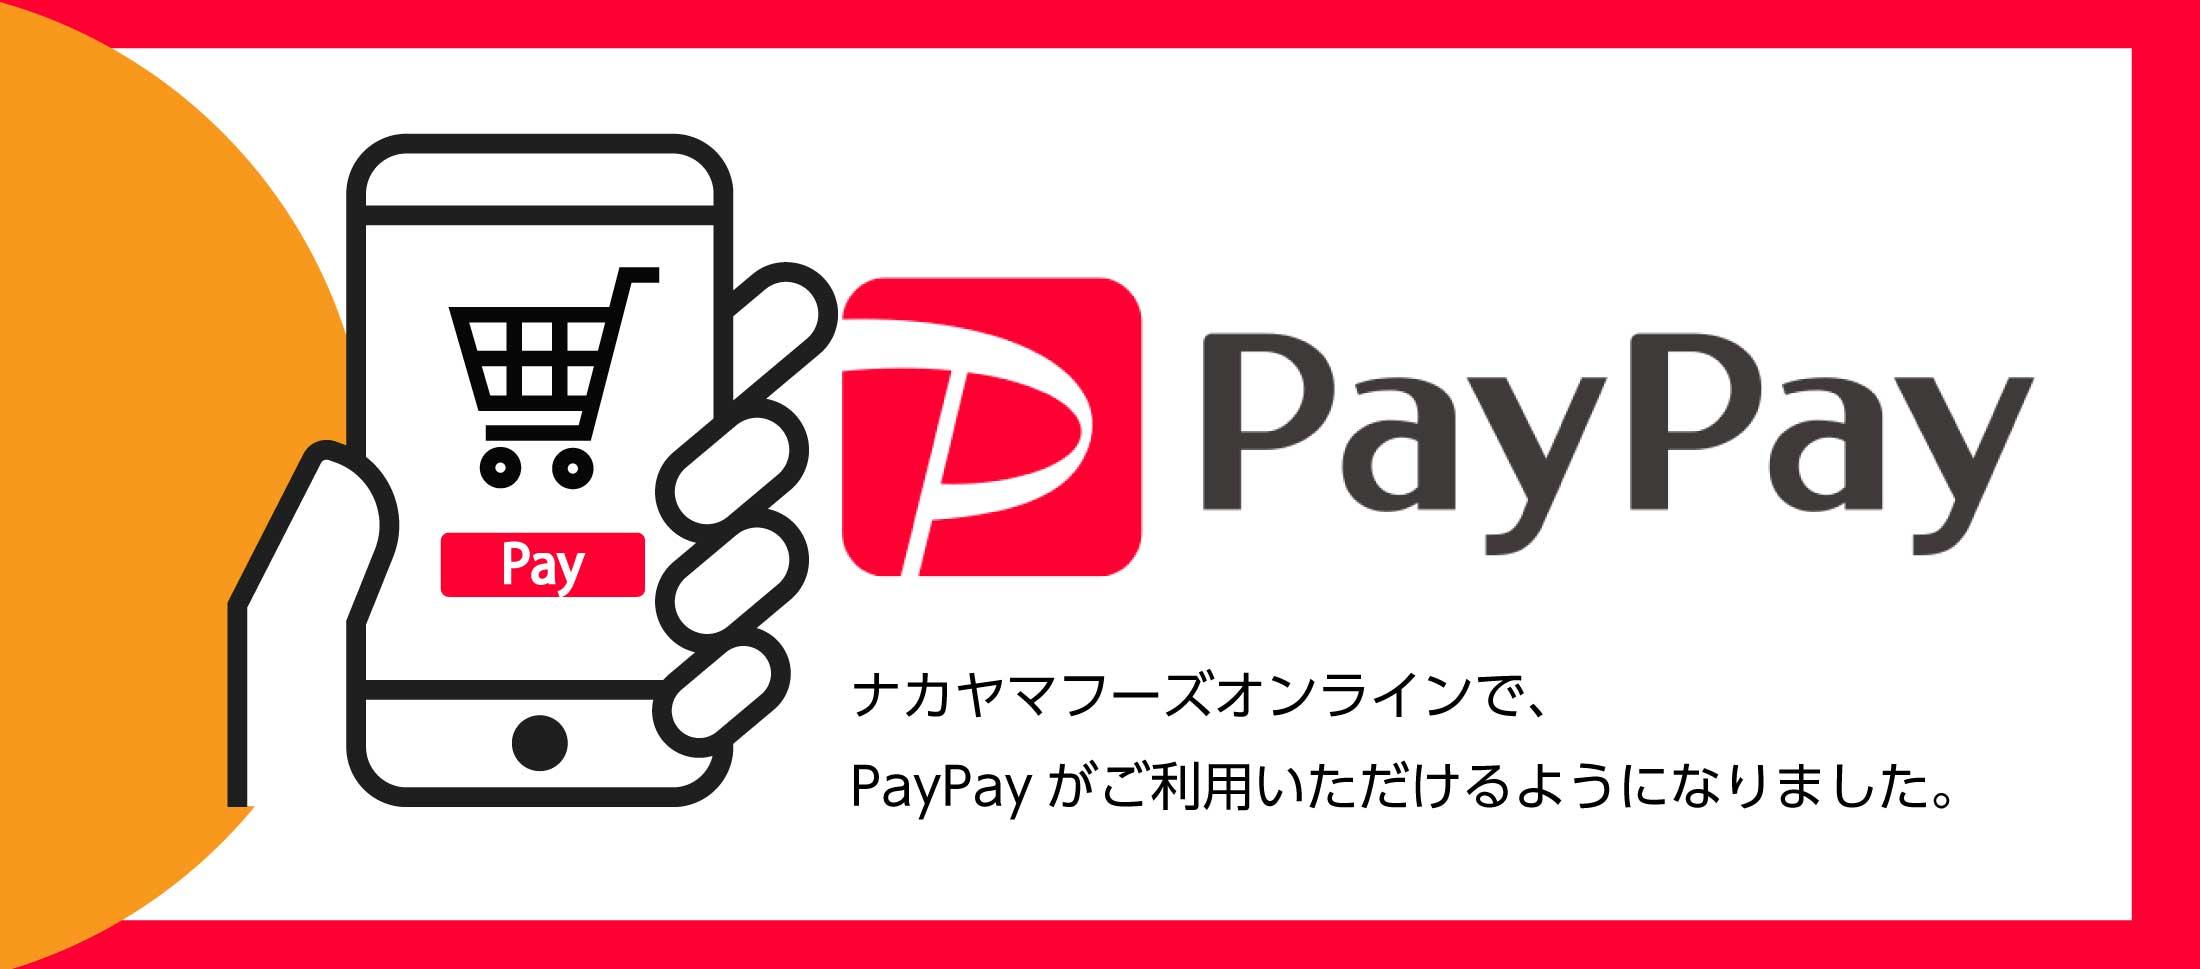 PayPay電子決済 ご利用 業務用食品・冷凍食品おすすめ 業務用食品・冷凍食品の通販 |ナカヤマフーズ